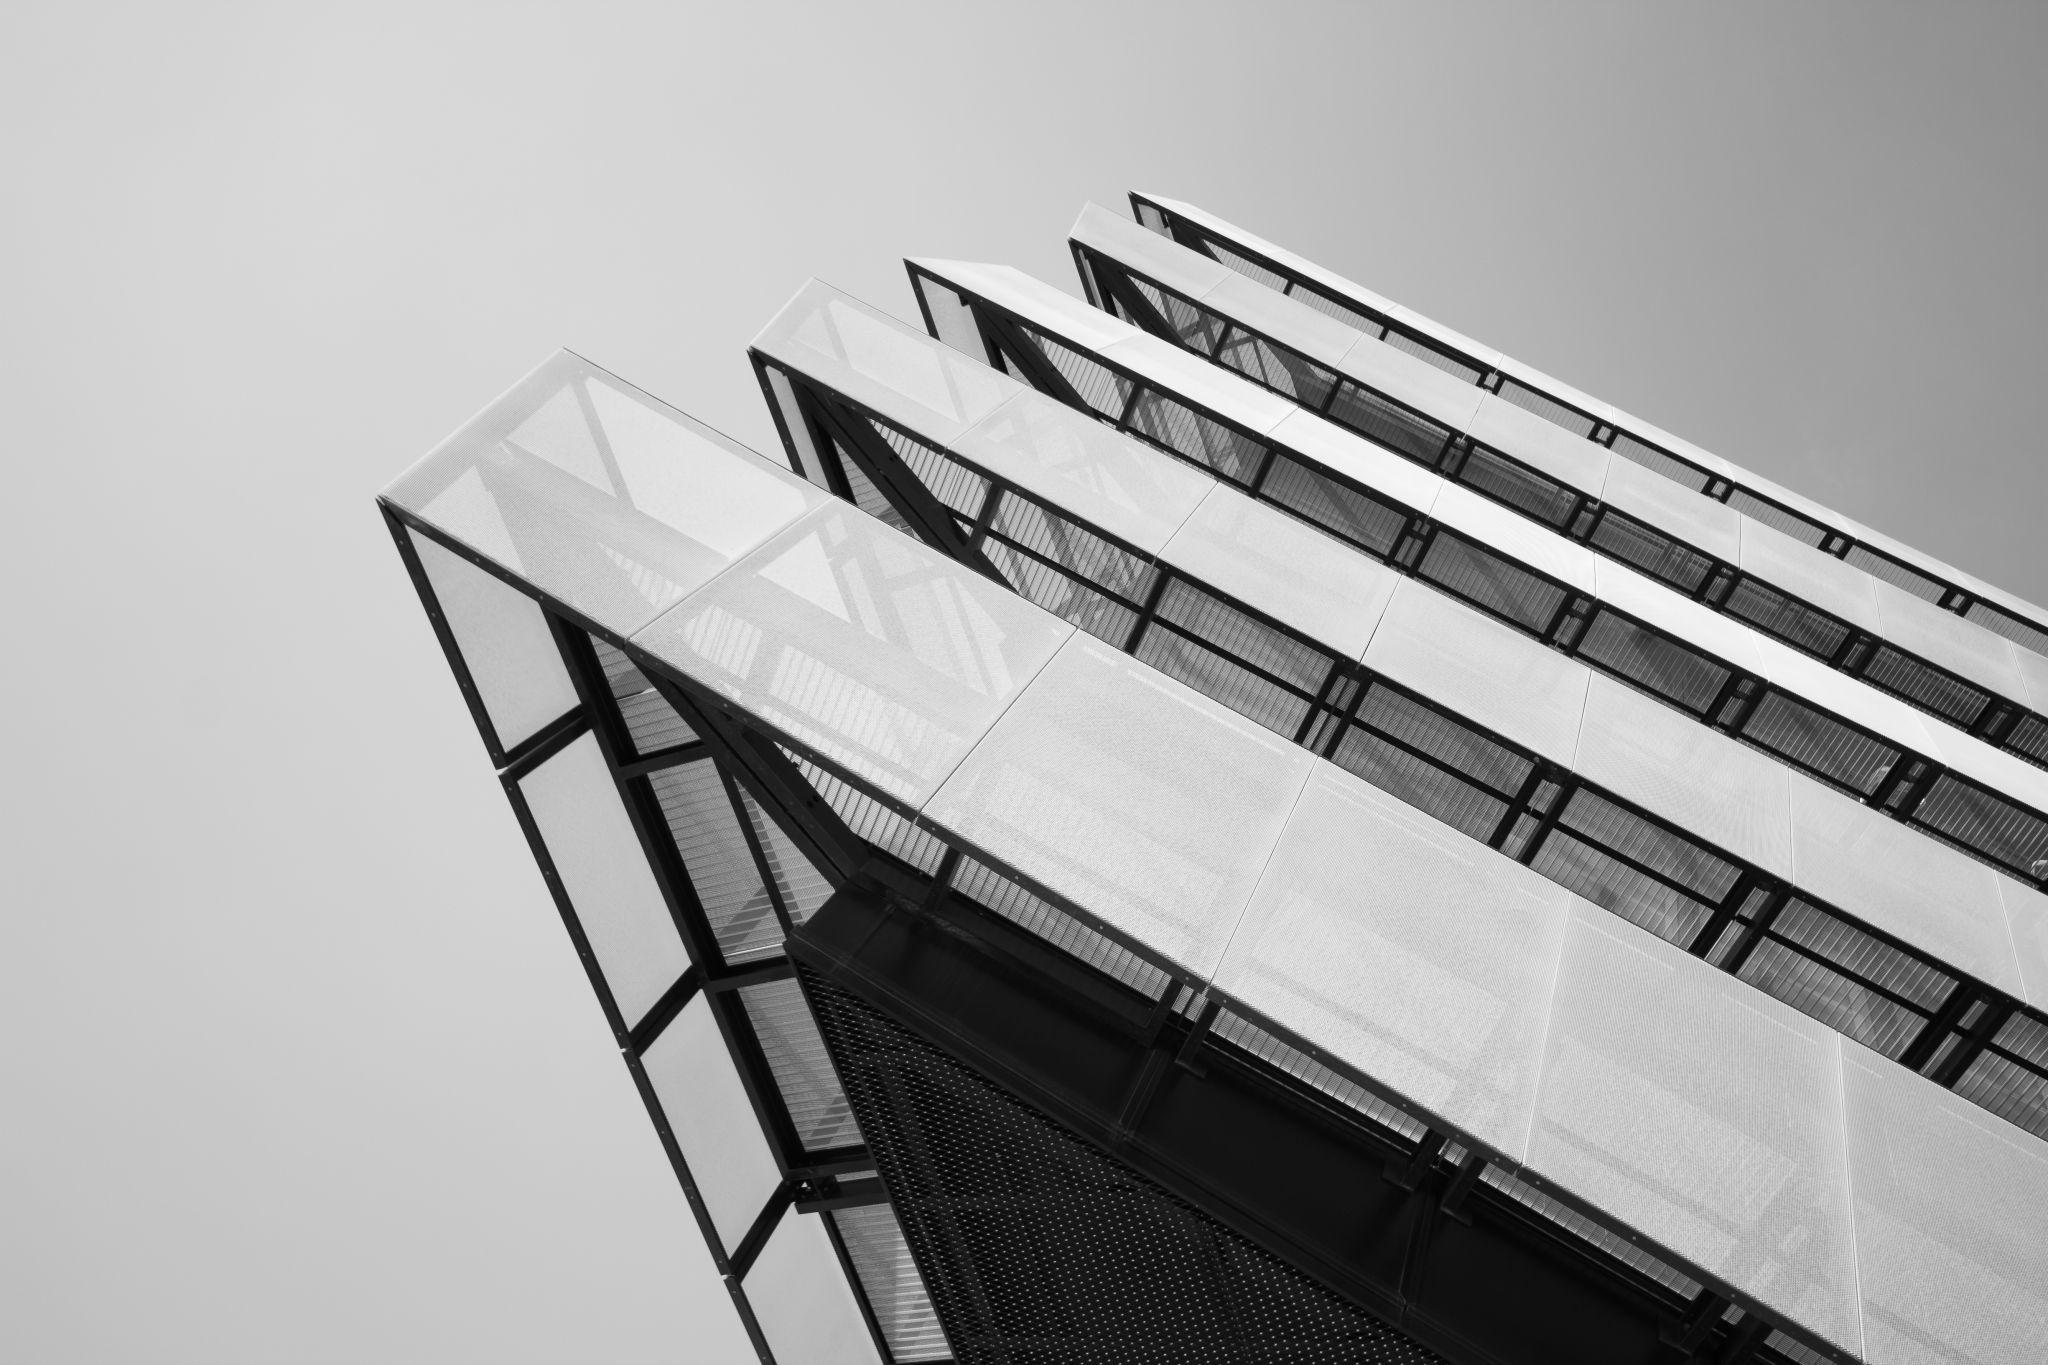 HafenCity University, Germany